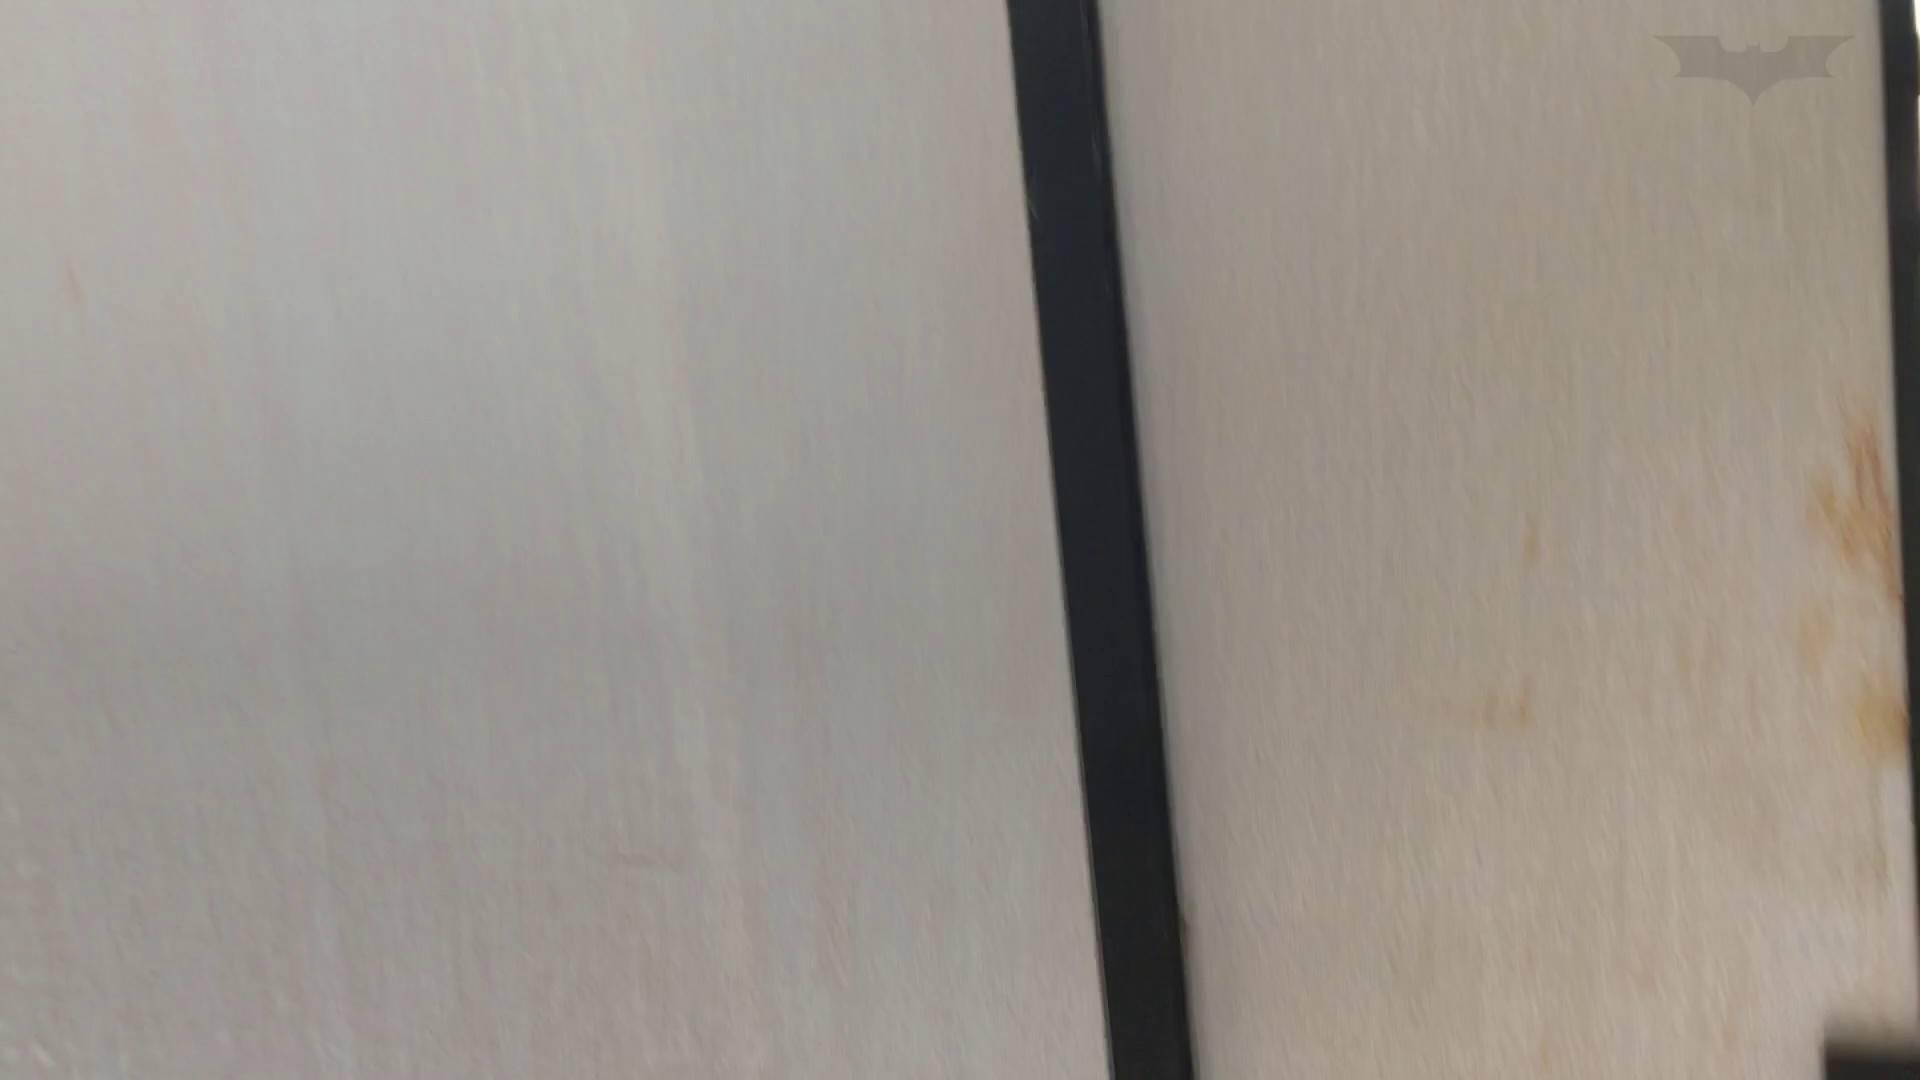 芸術大学ガチ潜入盗撮 JD盗撮 美女の洗面所の秘密 Vol.80 盛合せ  79PIX 26